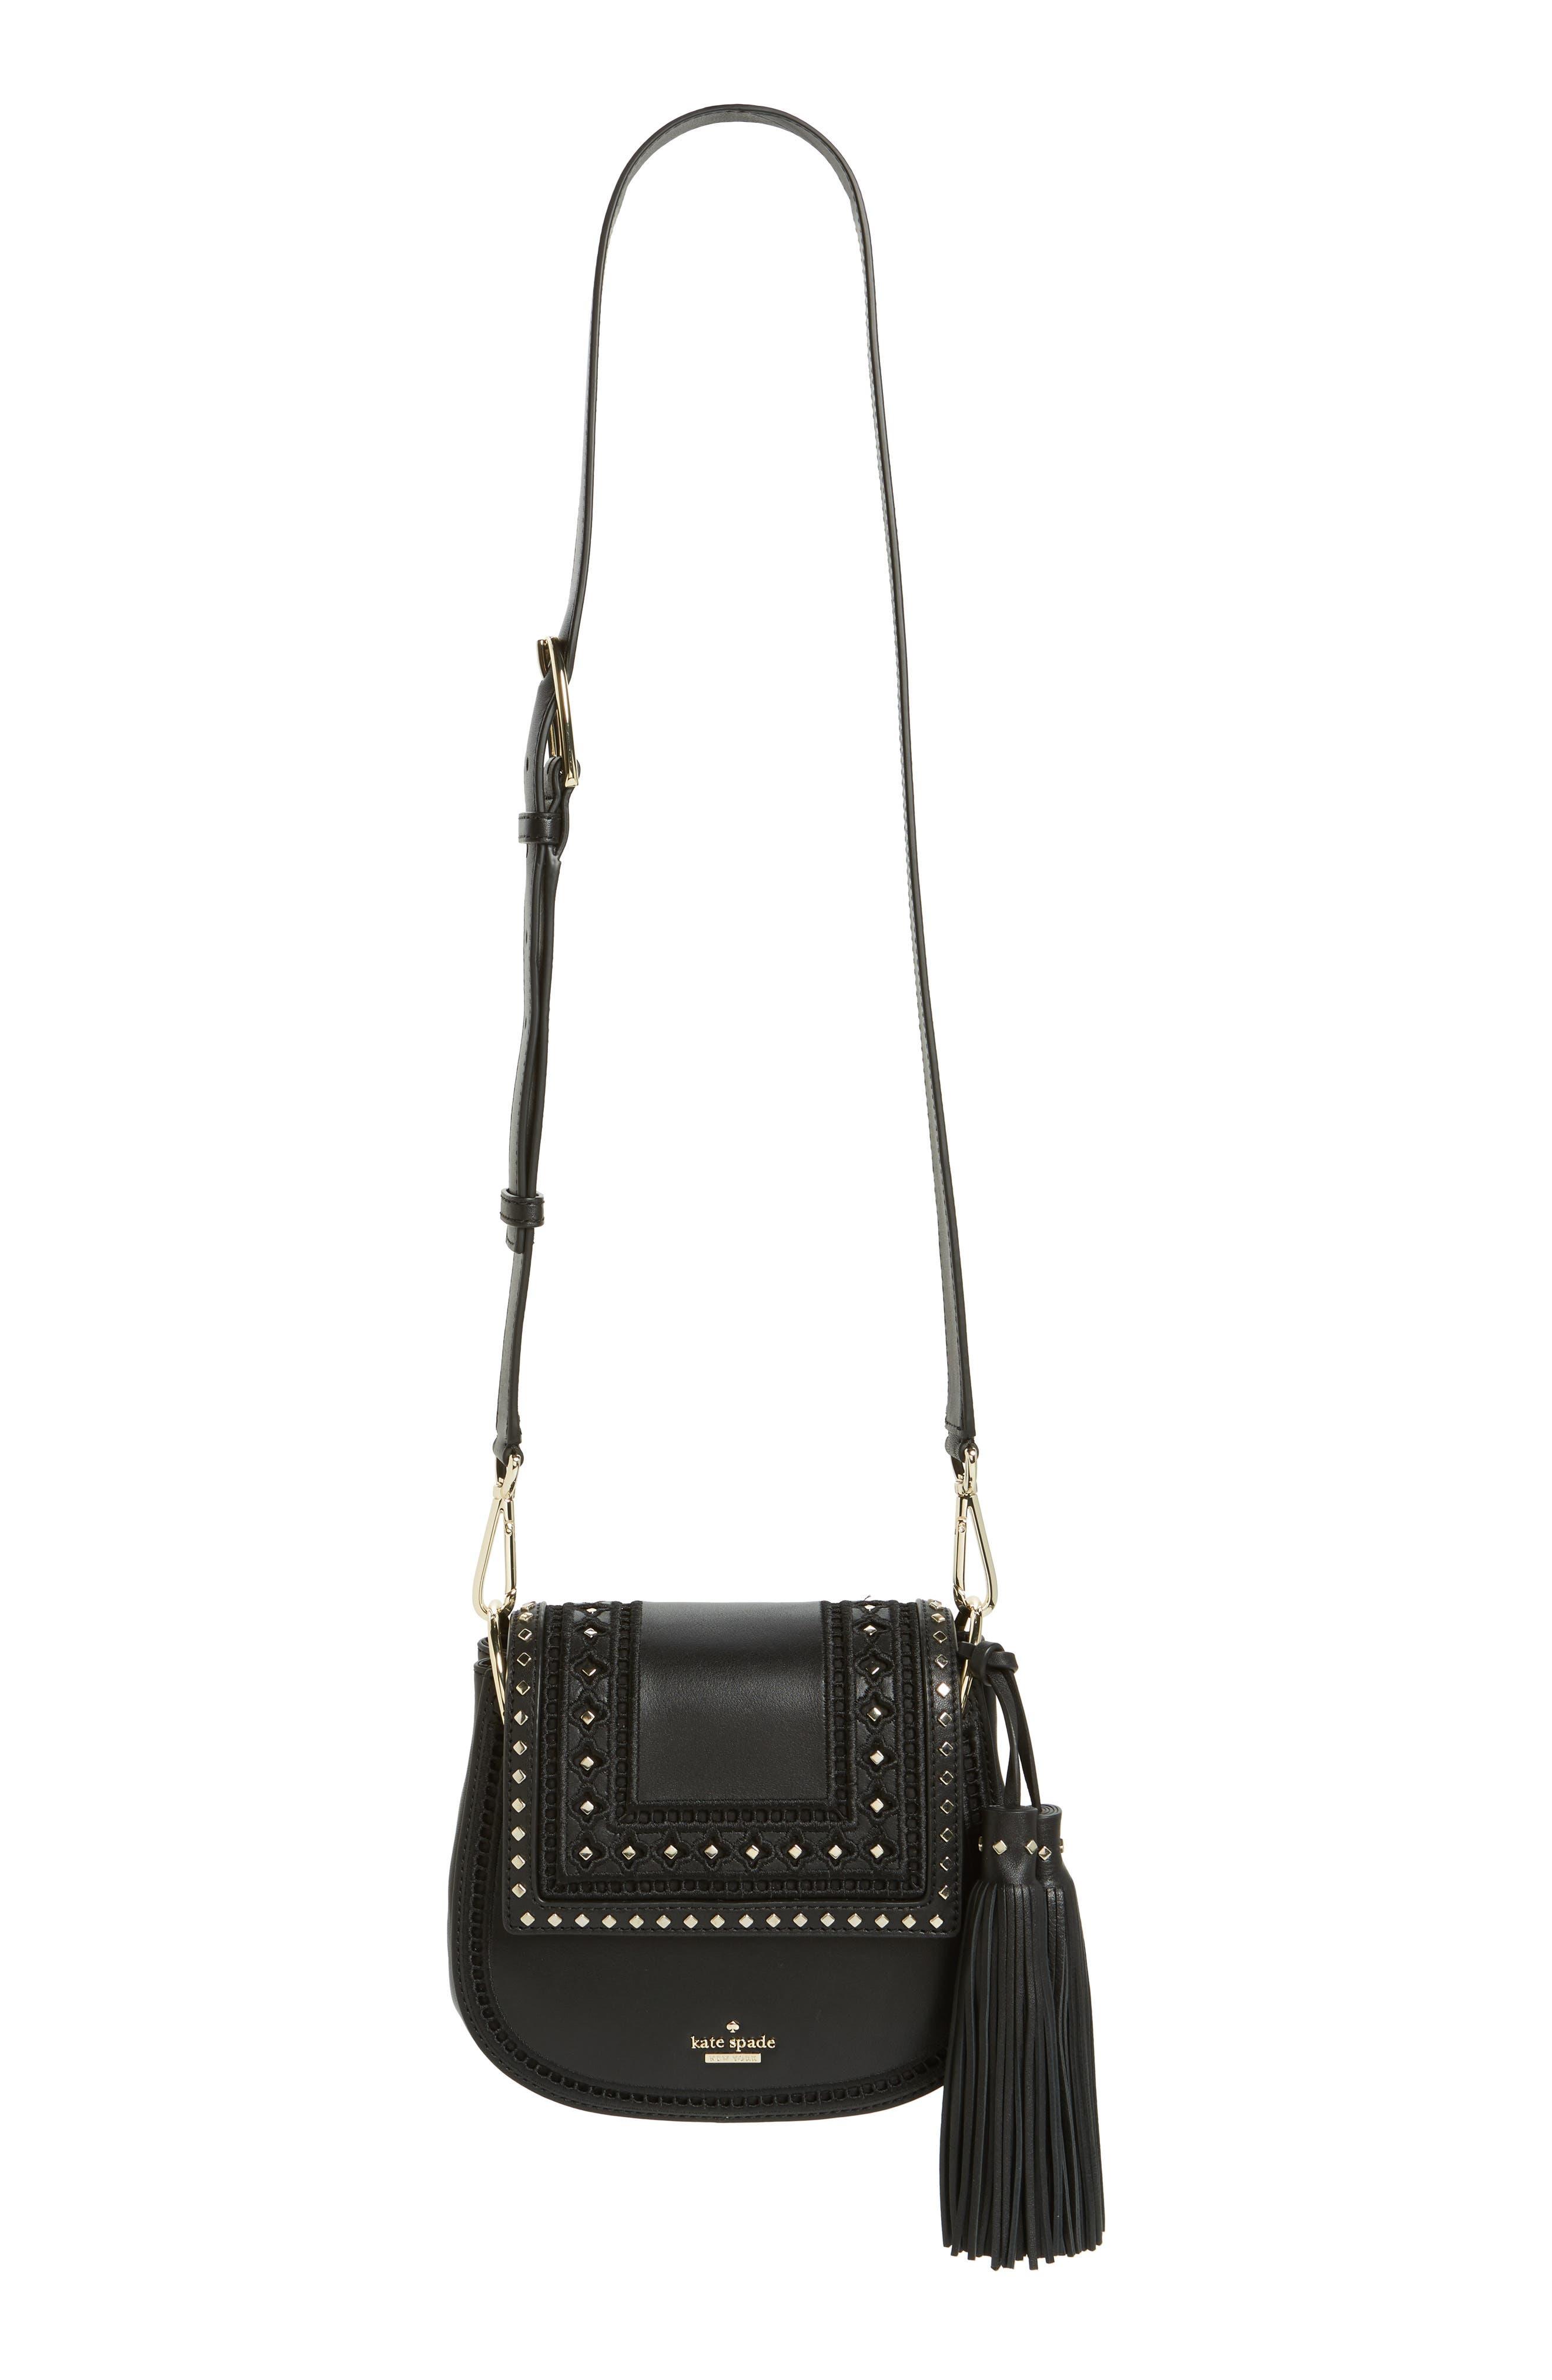 basset lane - small emaline leather crossbody bag, Main, color, 001